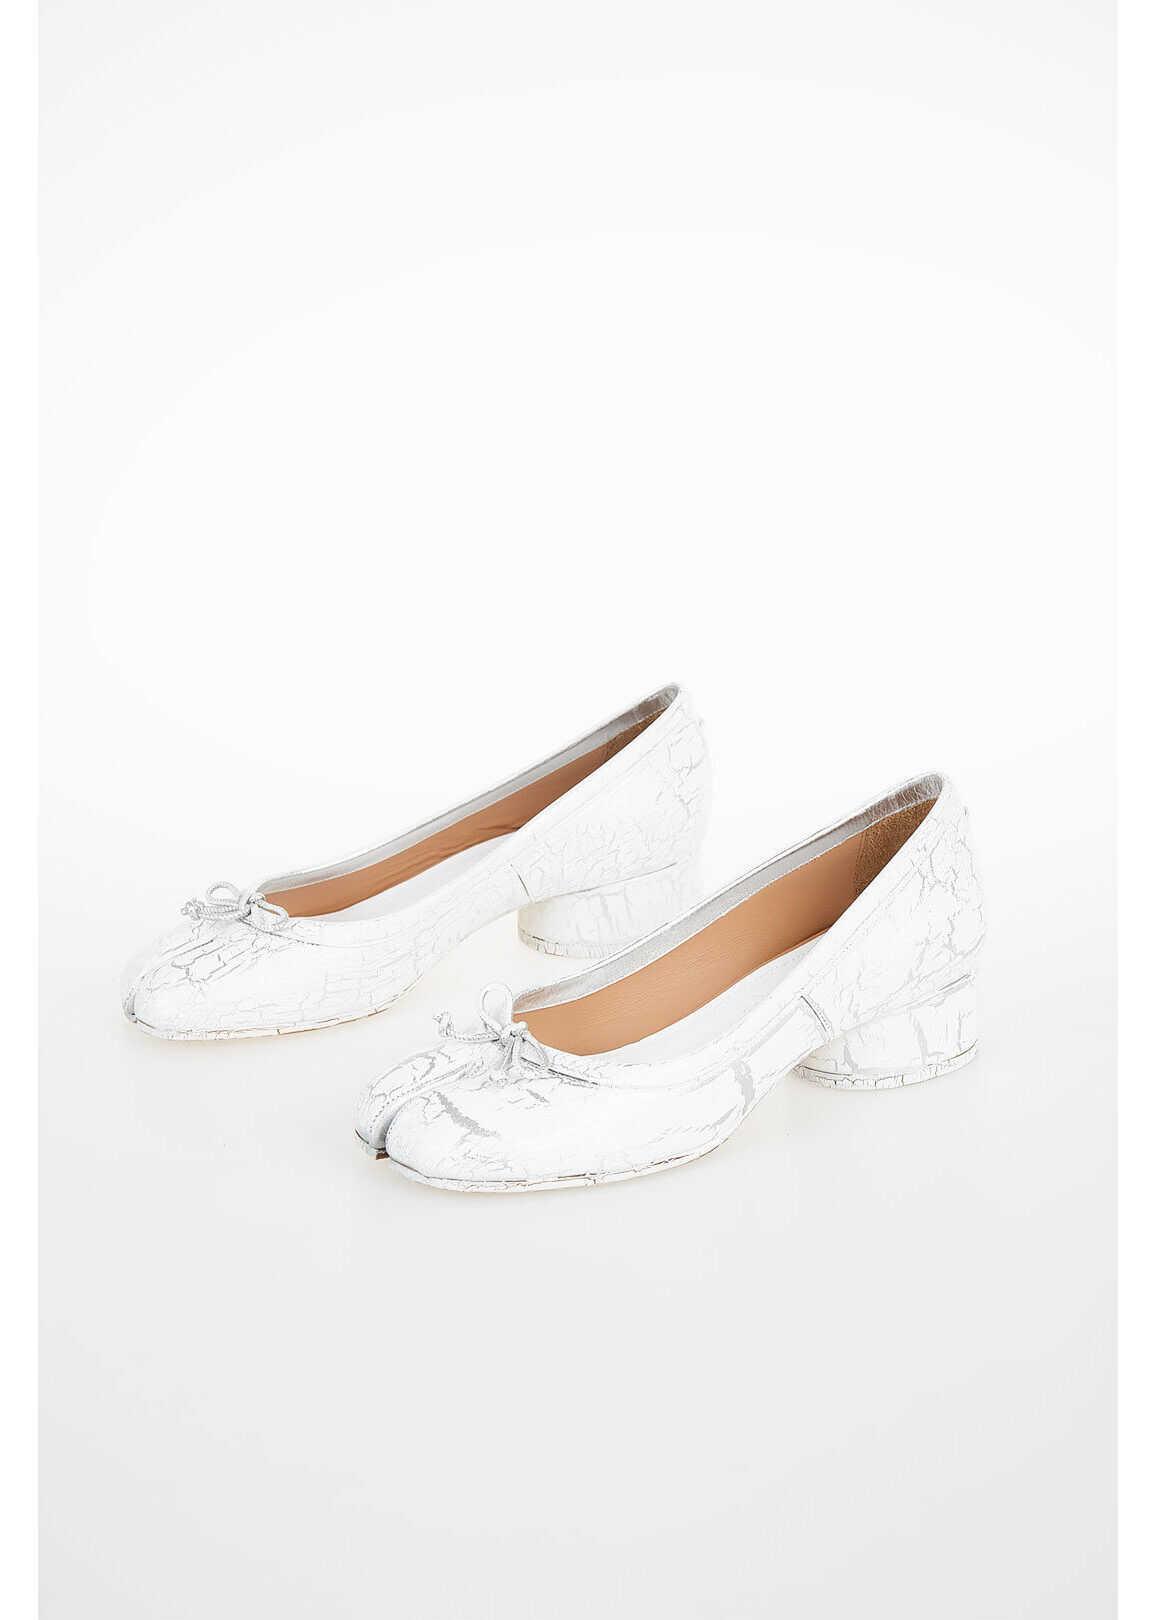 Maison Margiela MM22 Leather Ballet Flat WHITE